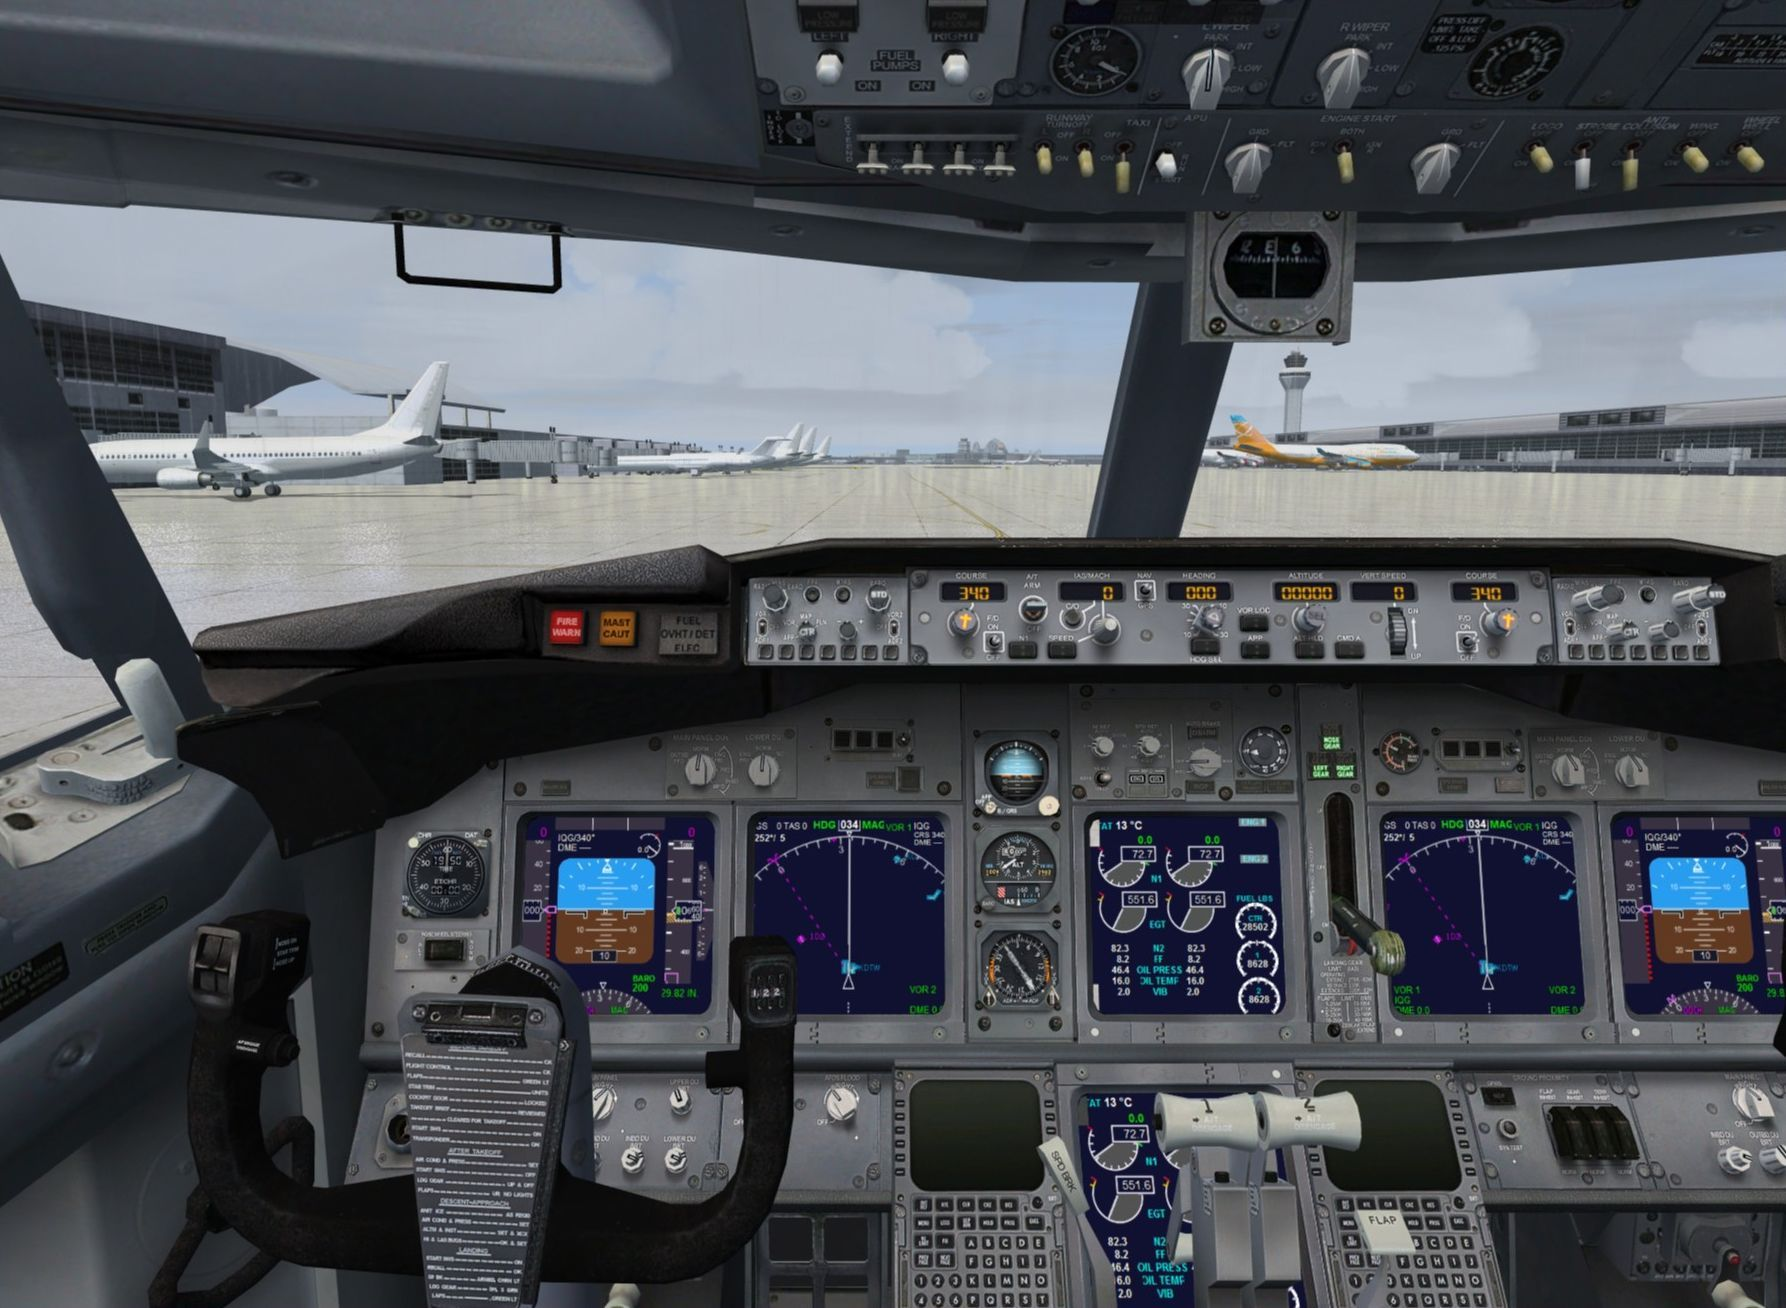 Flight simulator 2019 pc requirements